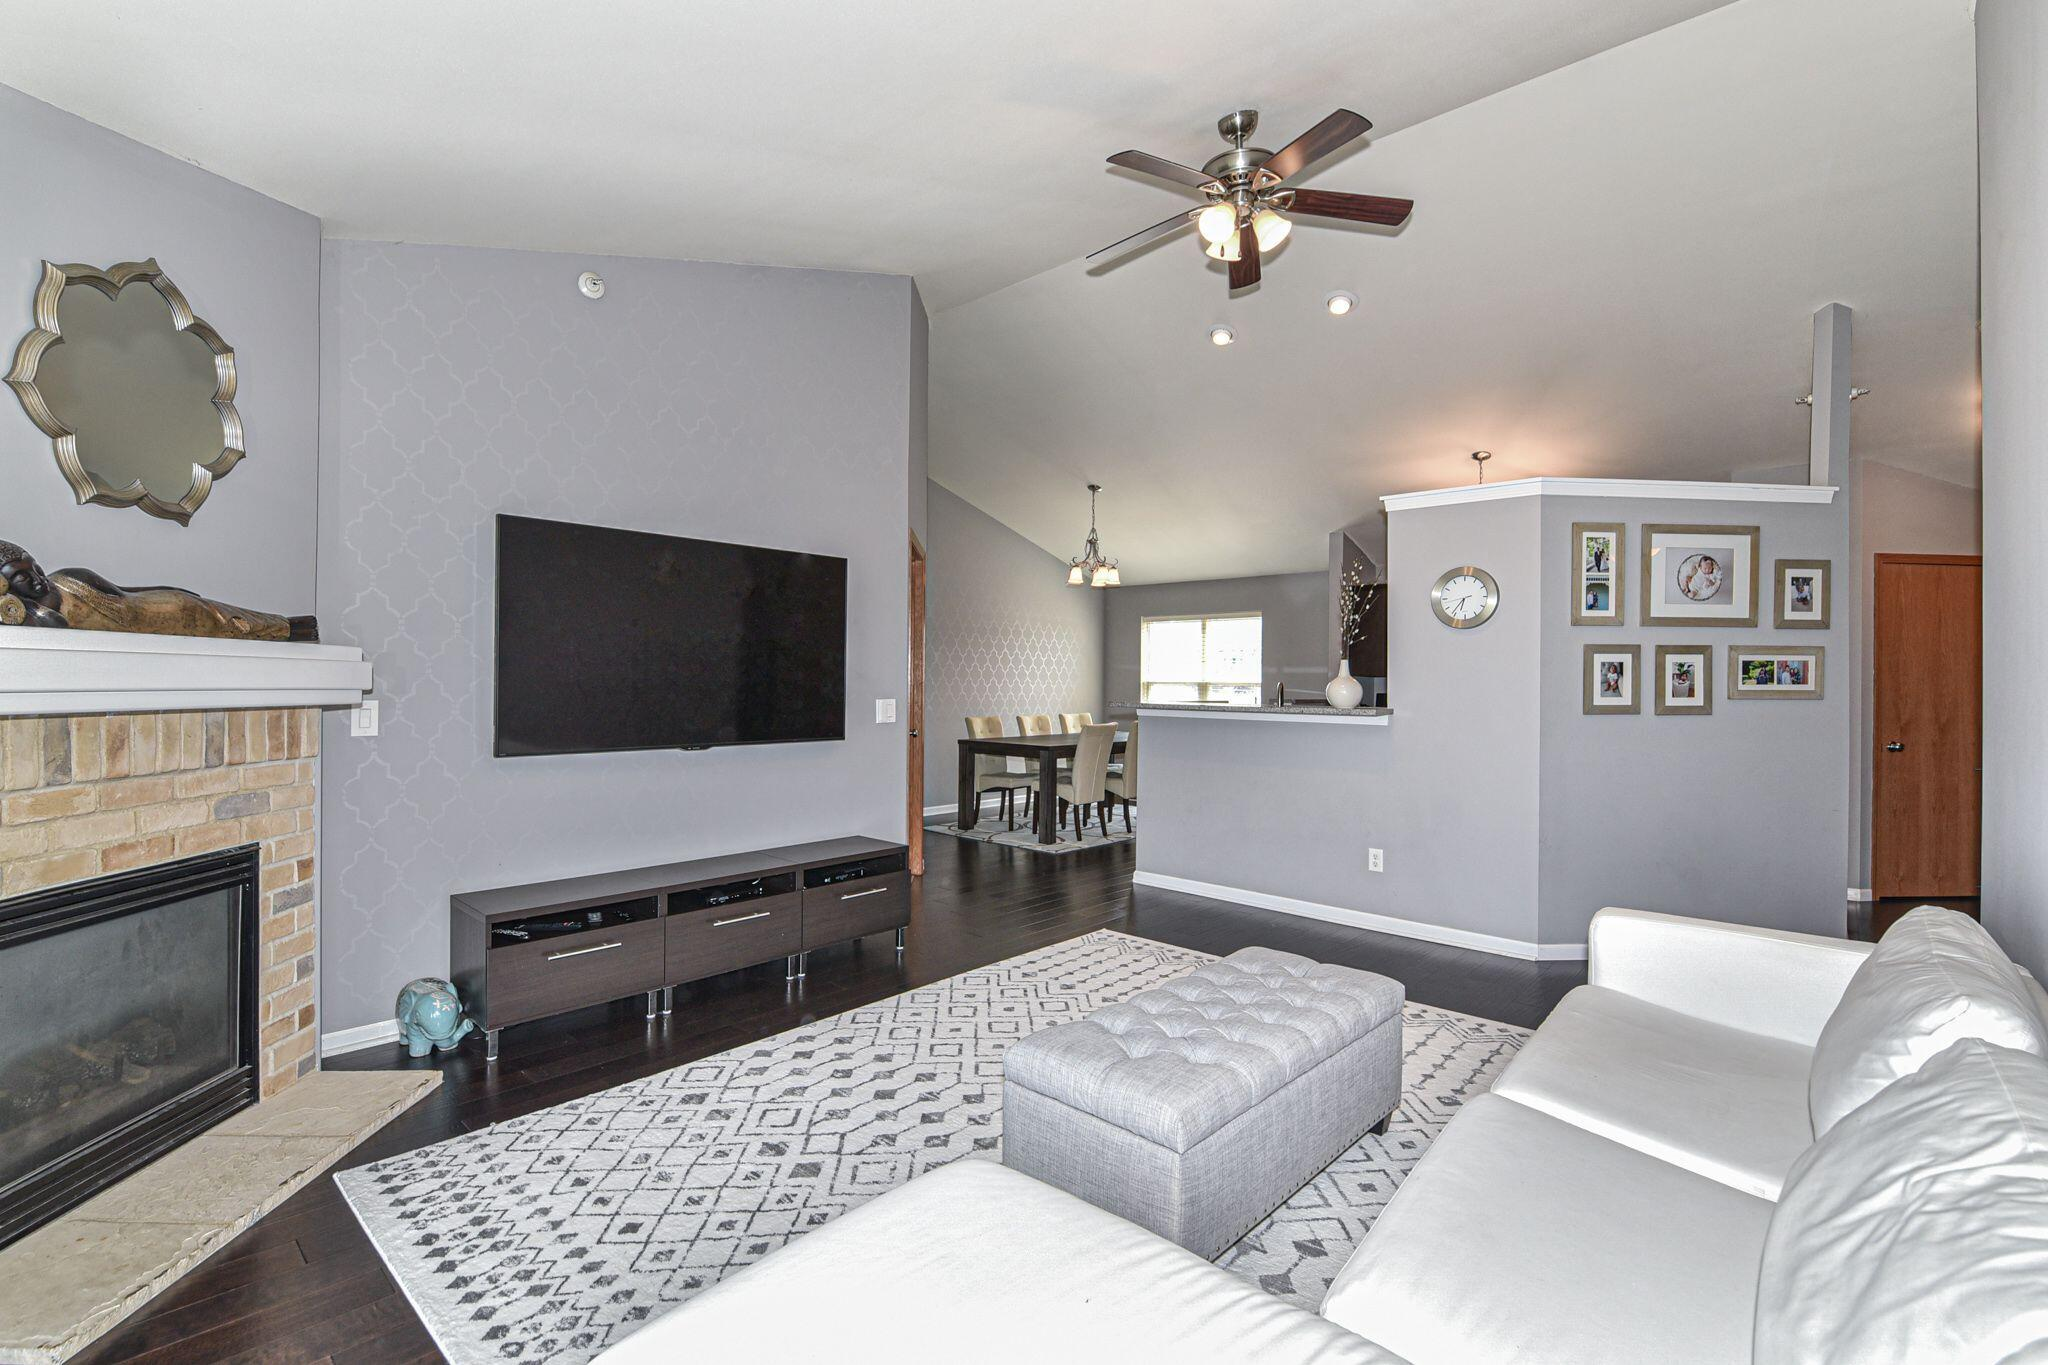 7005 Rawson Ave, Franklin, Wisconsin 53132, 2 Bedrooms Bedrooms, 5 Rooms Rooms,2 BathroomsBathrooms,Condominiums,For Sale,Rawson Ave,2,1755283